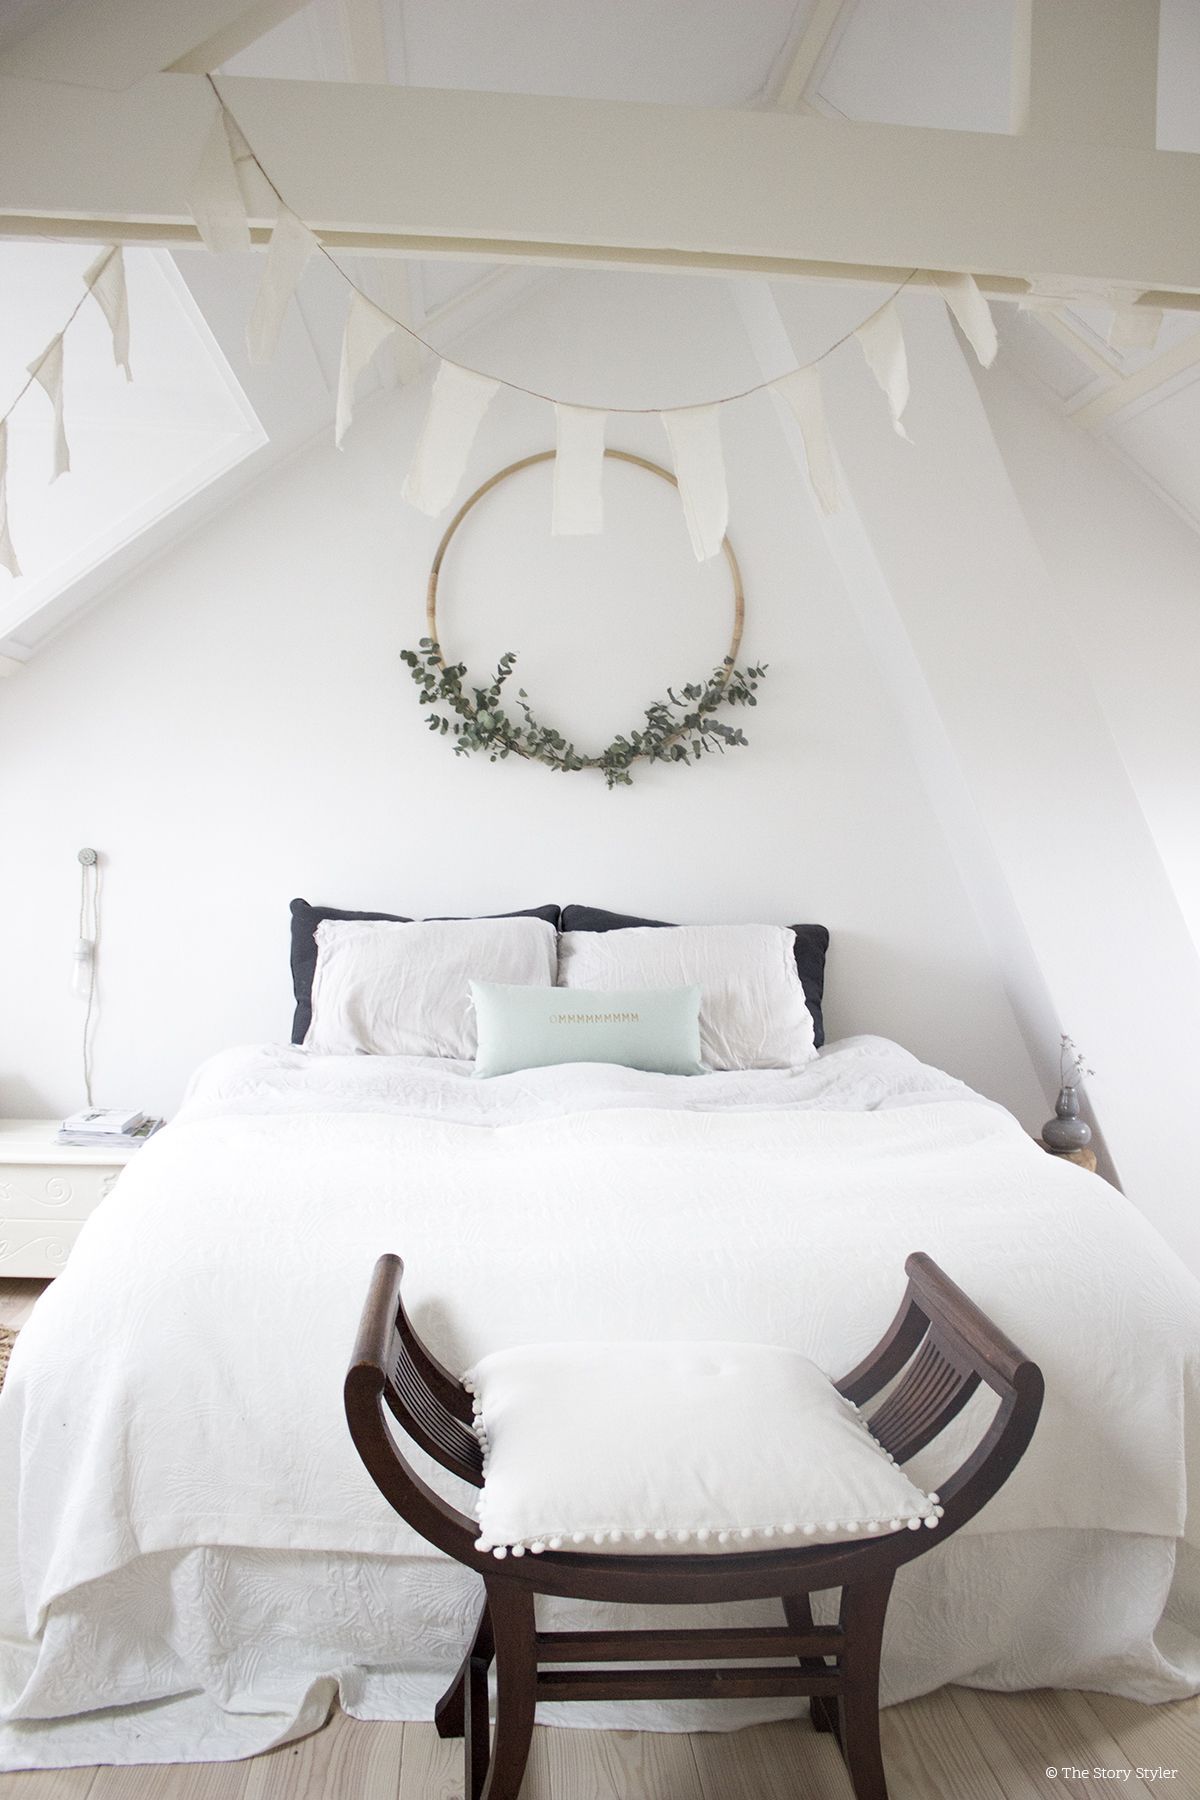 Ikea hack: diy eucalyptus krans | diy. | Pinterest | Bedroom, Room ...